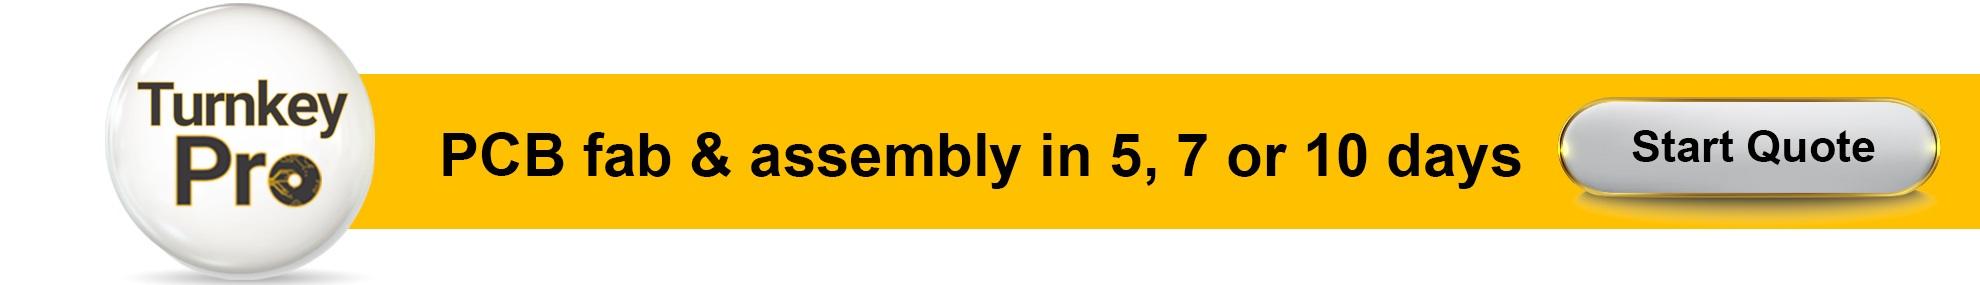 Turnkey Pro Blog Banner